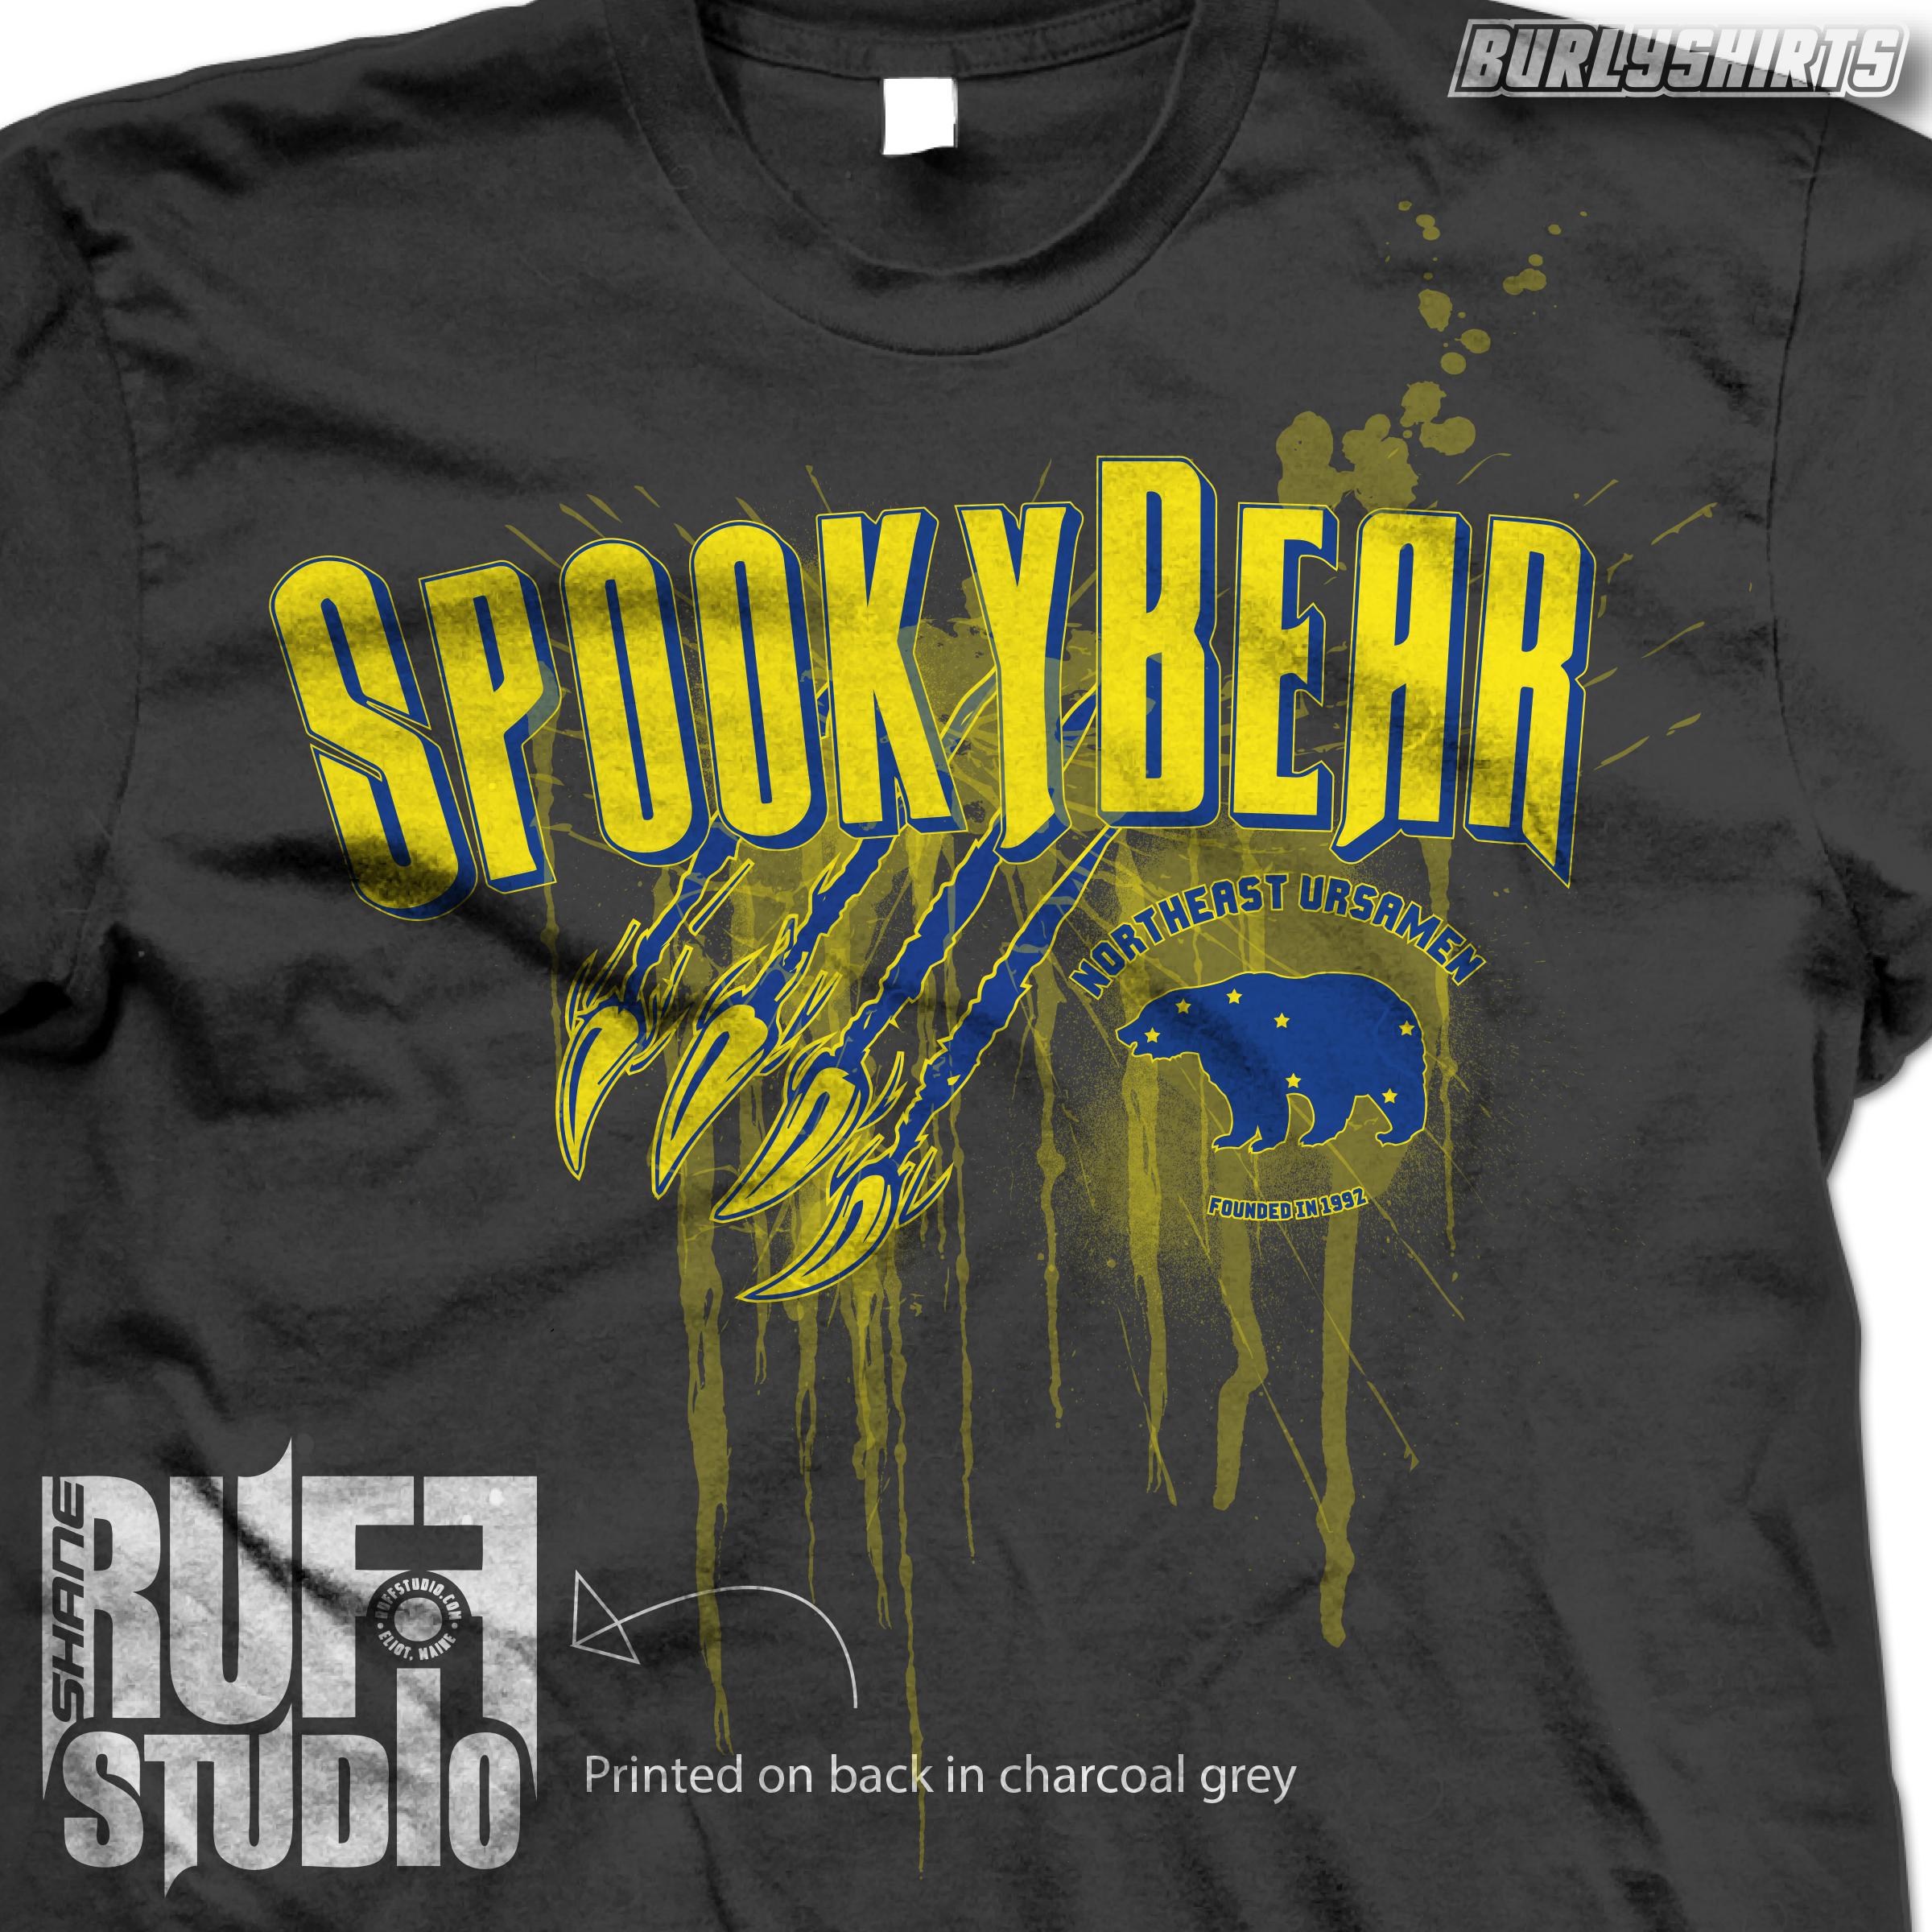 spookybear-mock-moc1b.jpg